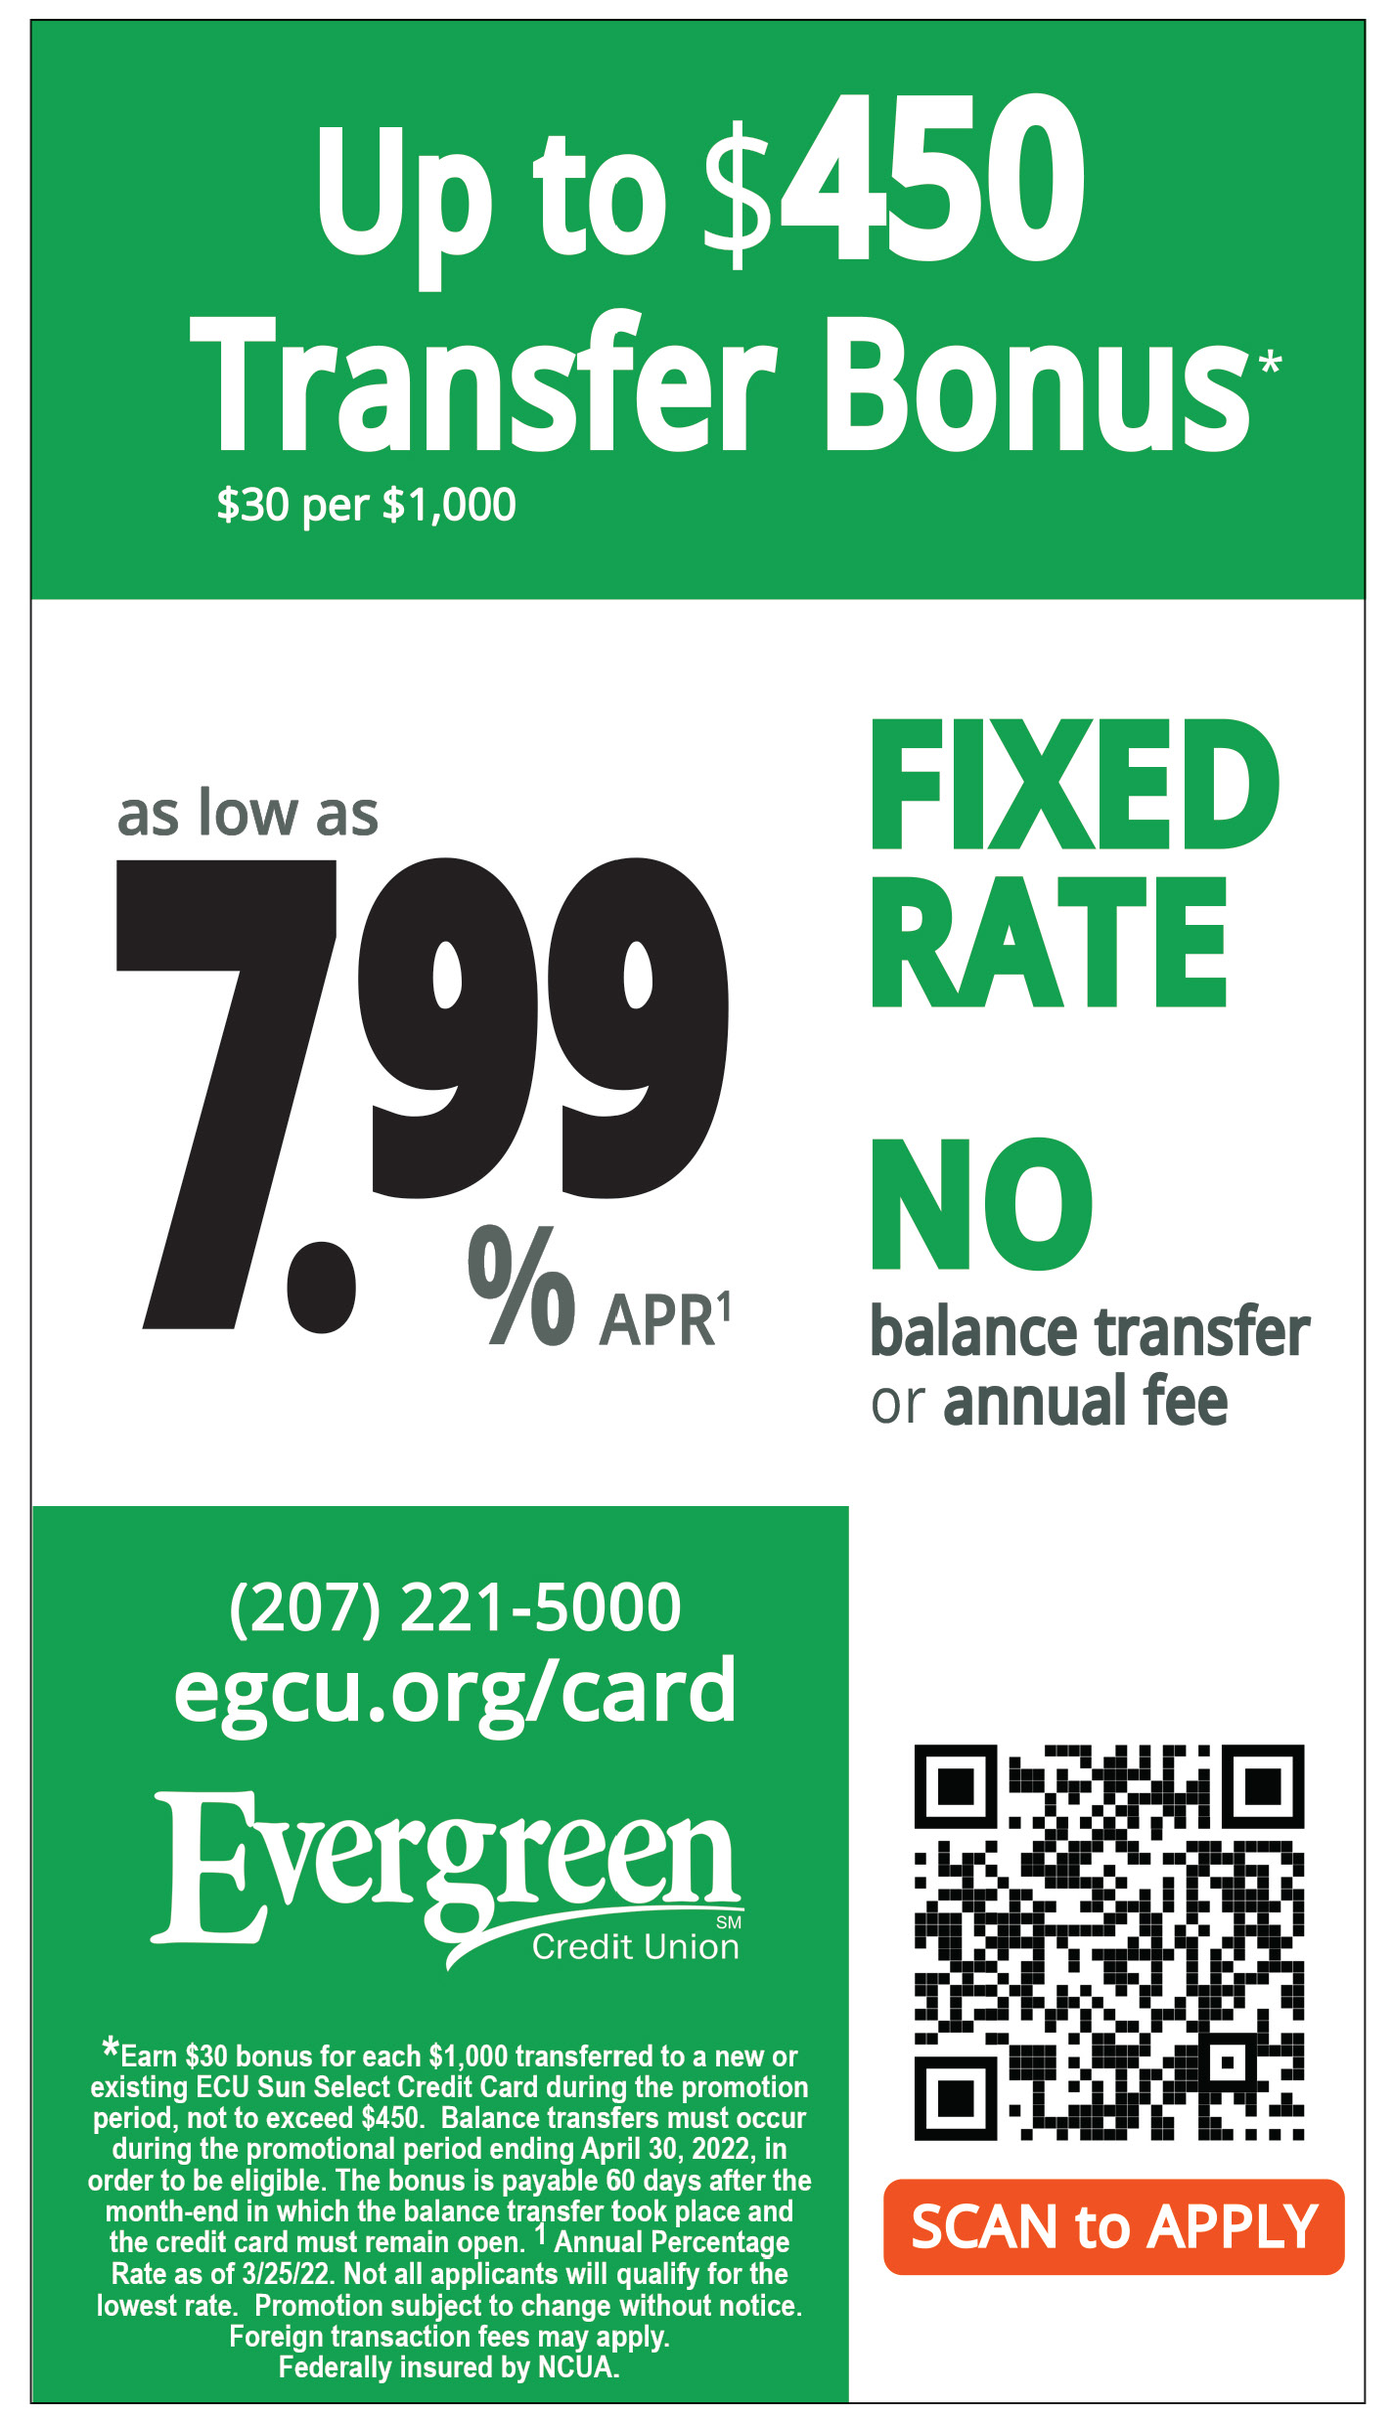 https://www.egcu.org/cards